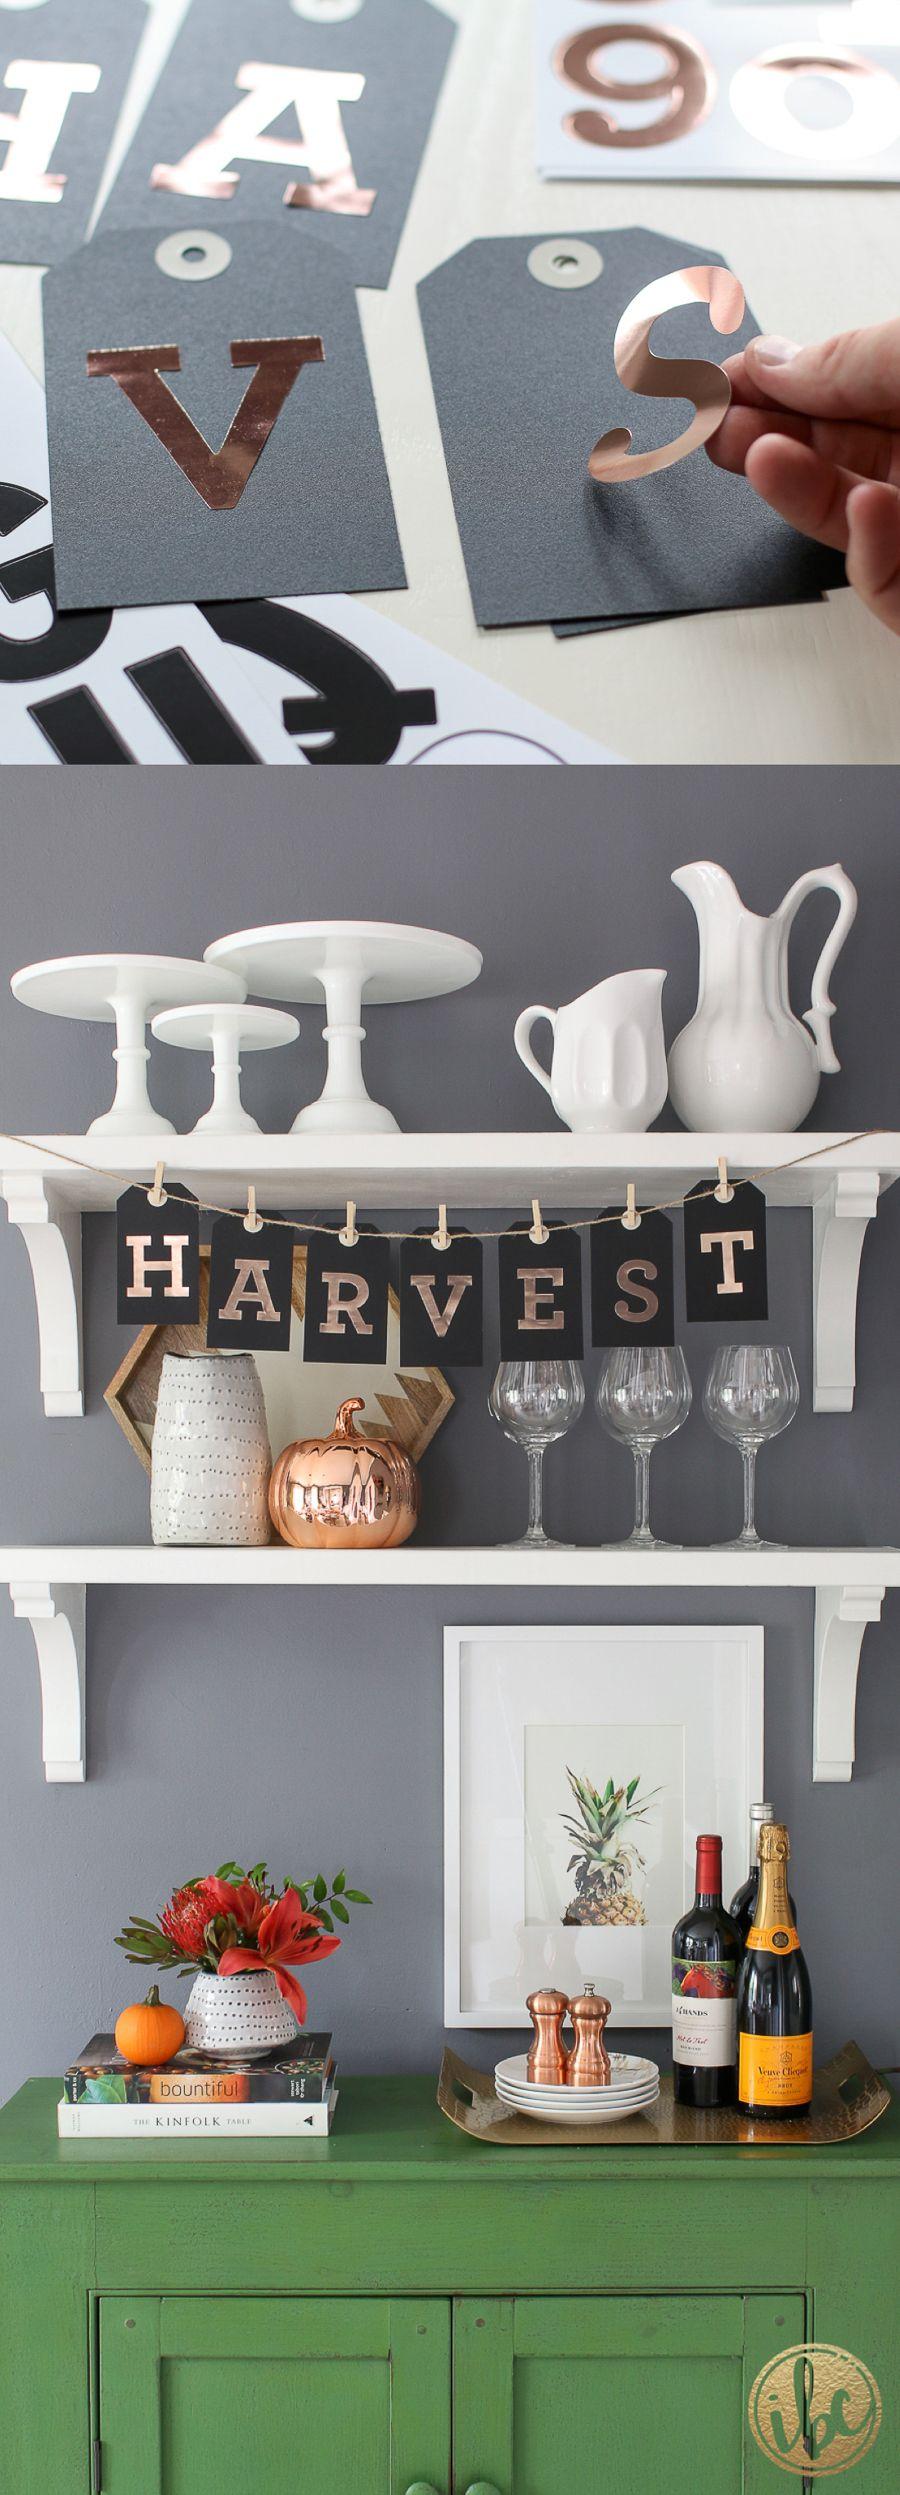 DIY Harvest Banner - fall decorating ideas / DIY Tag Banner